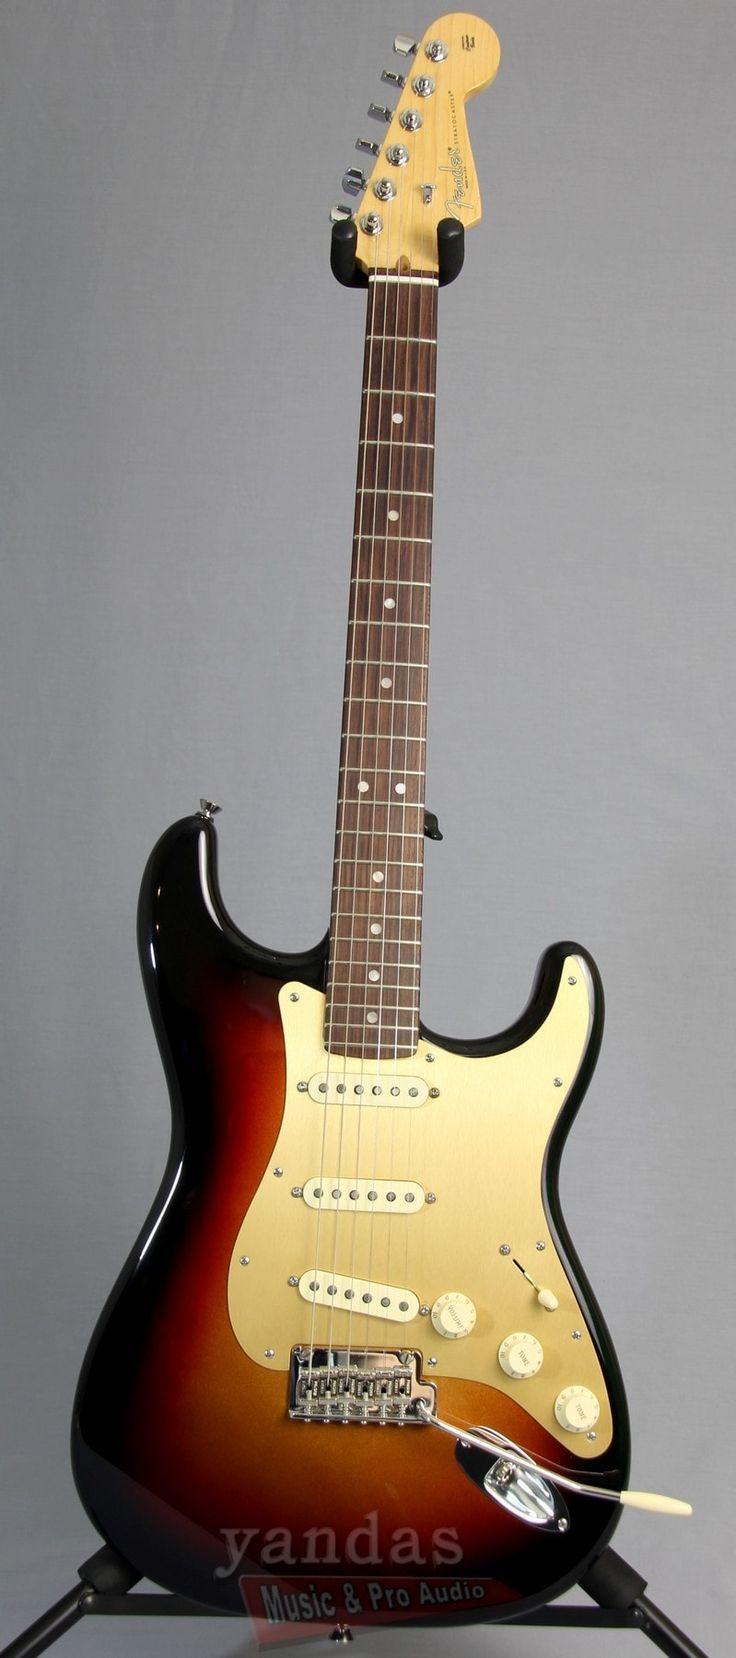 Clearance | Fender FSR American Standard Stratocaster V Neck